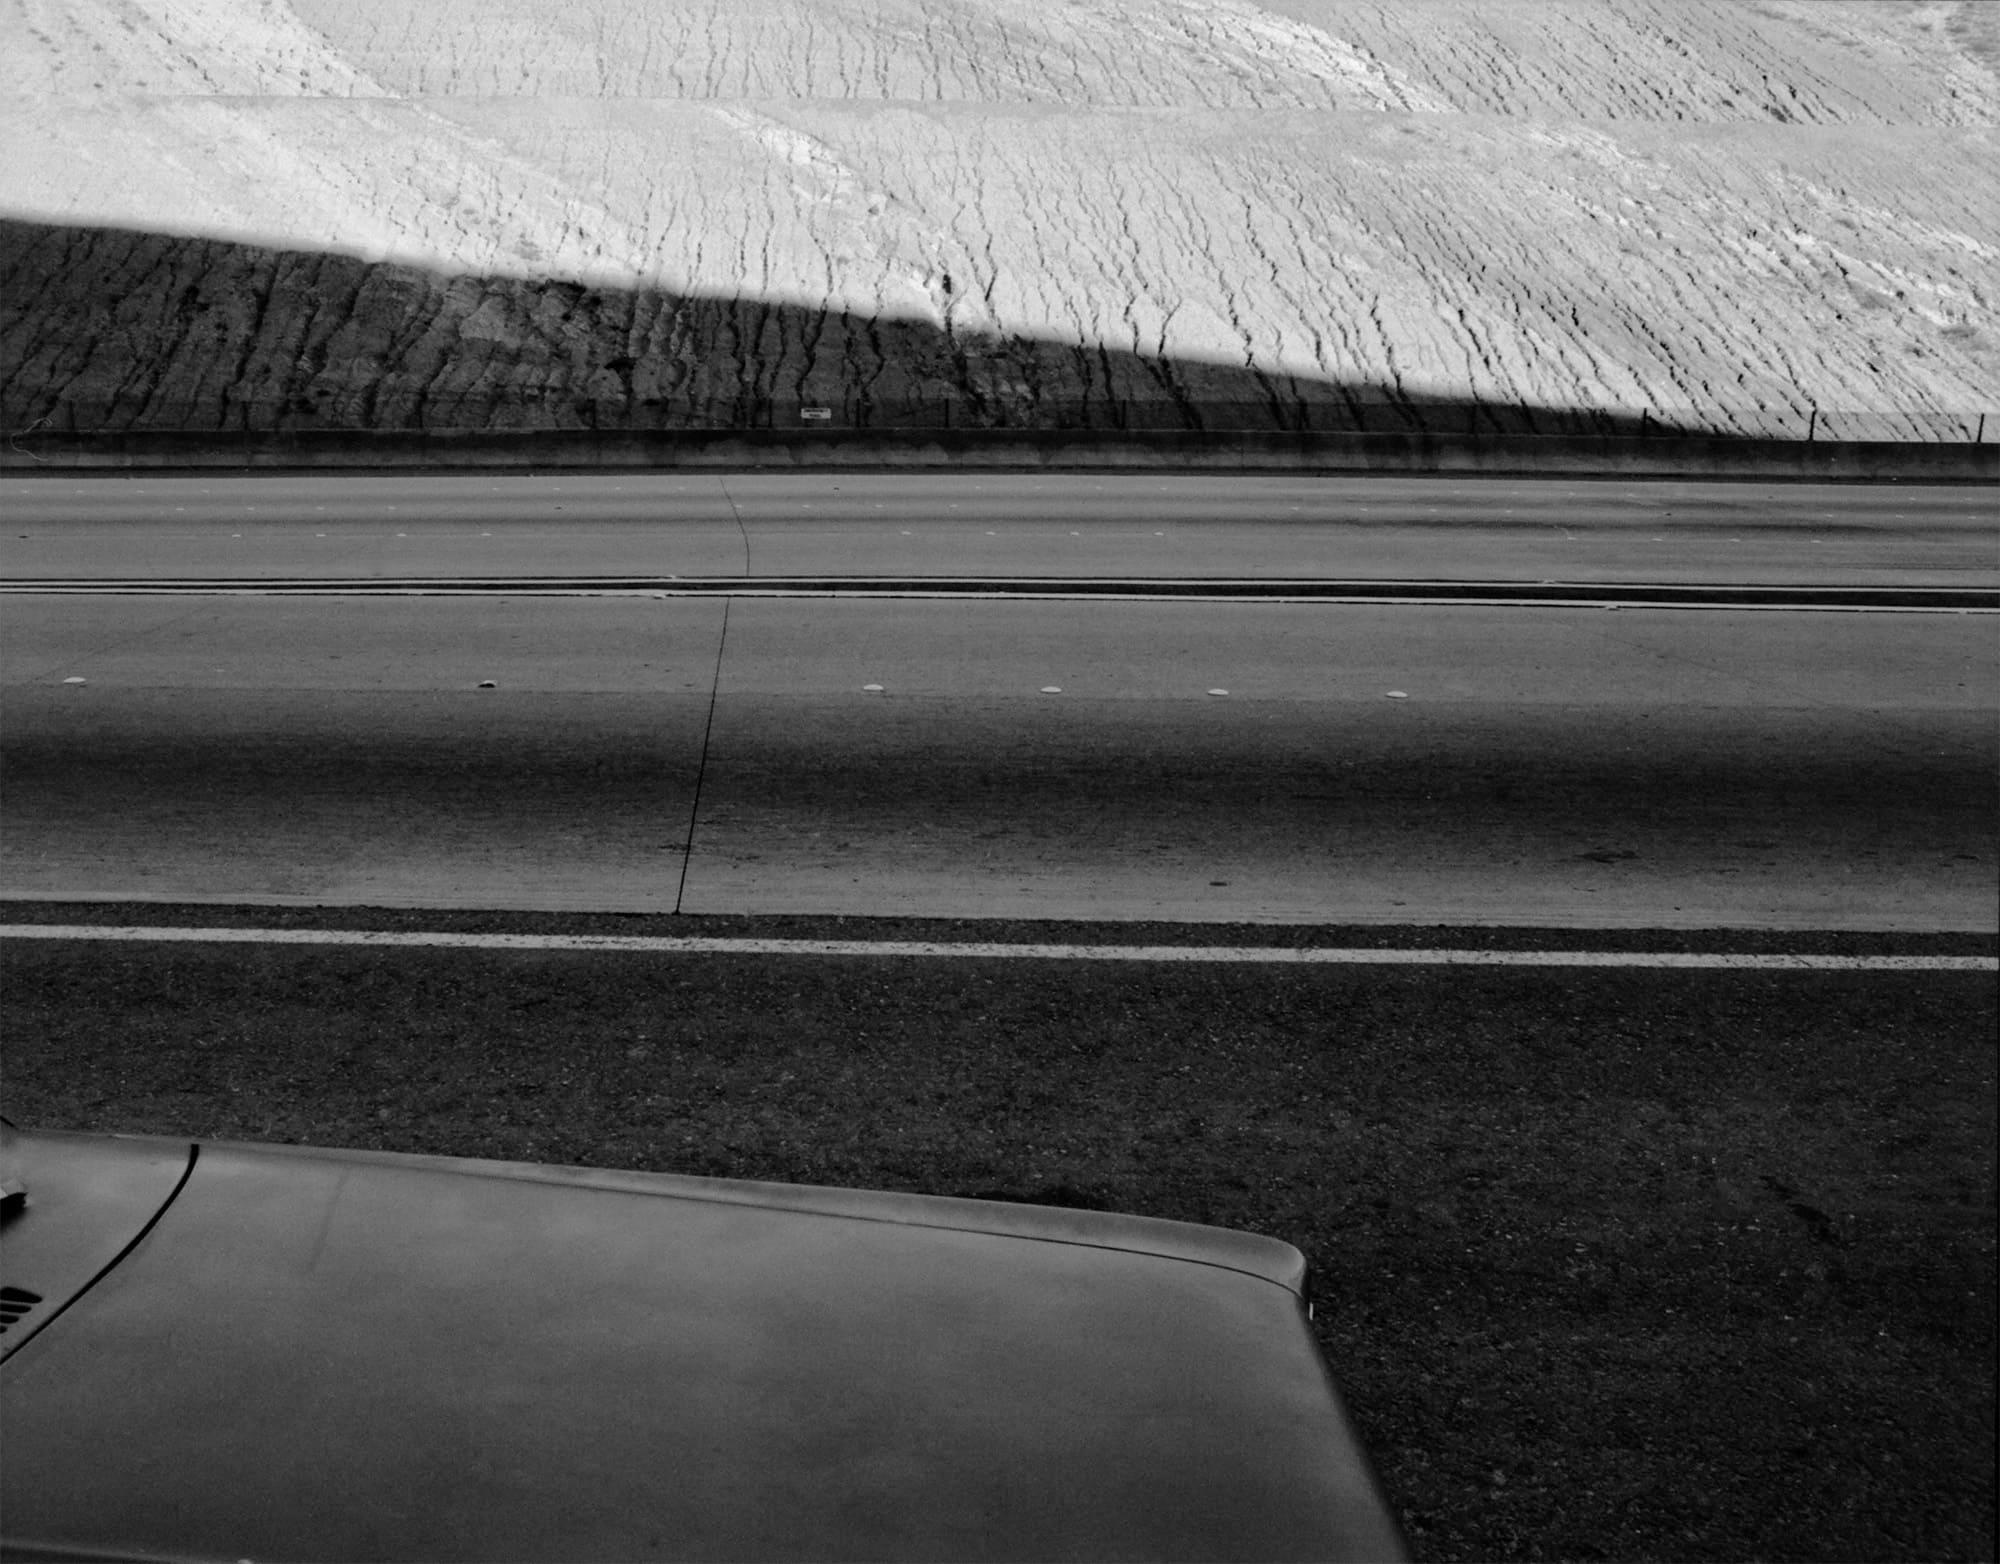 Interstate 5, California, USA 1976